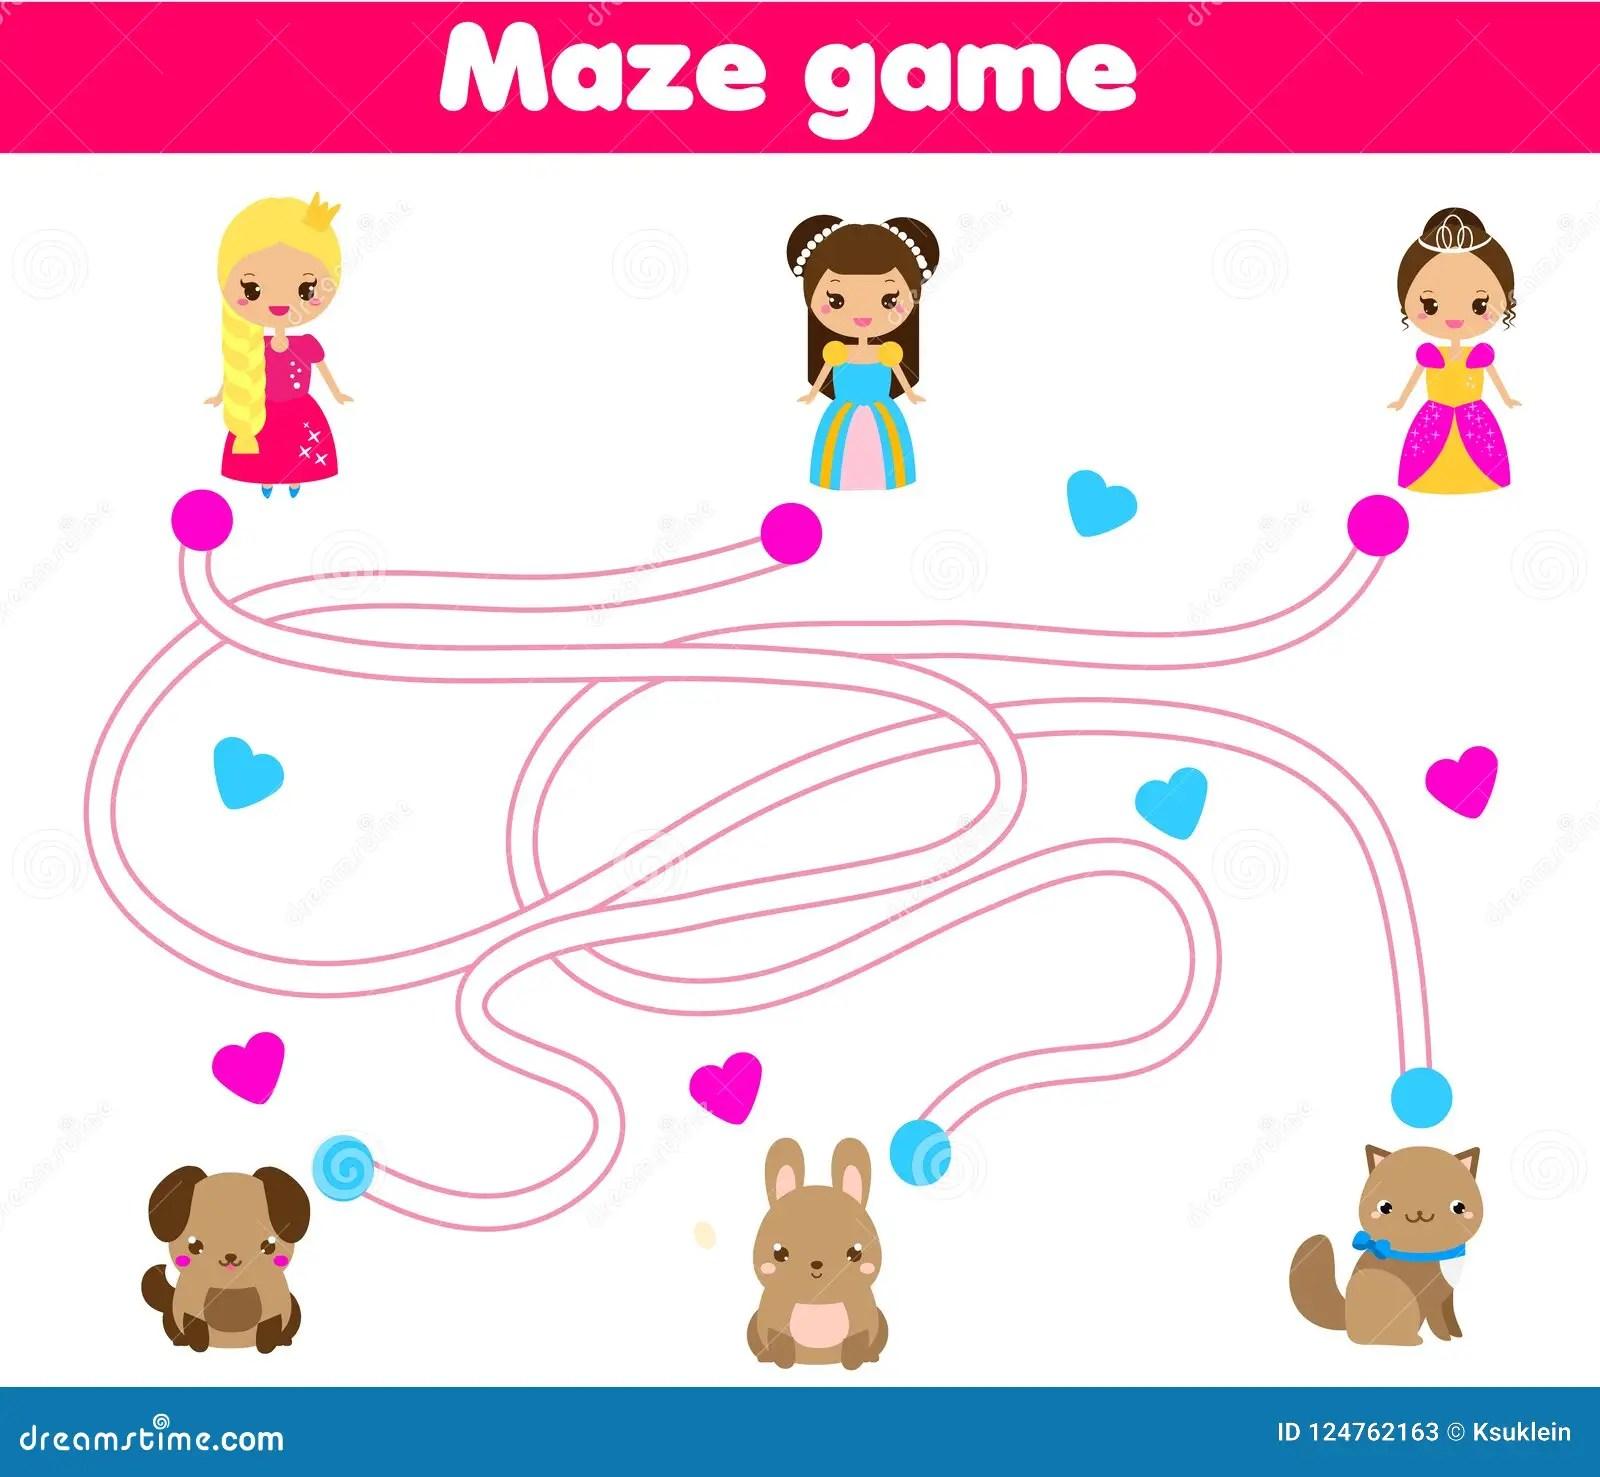 Maze Game Help Princess Find Pet Activity For Children